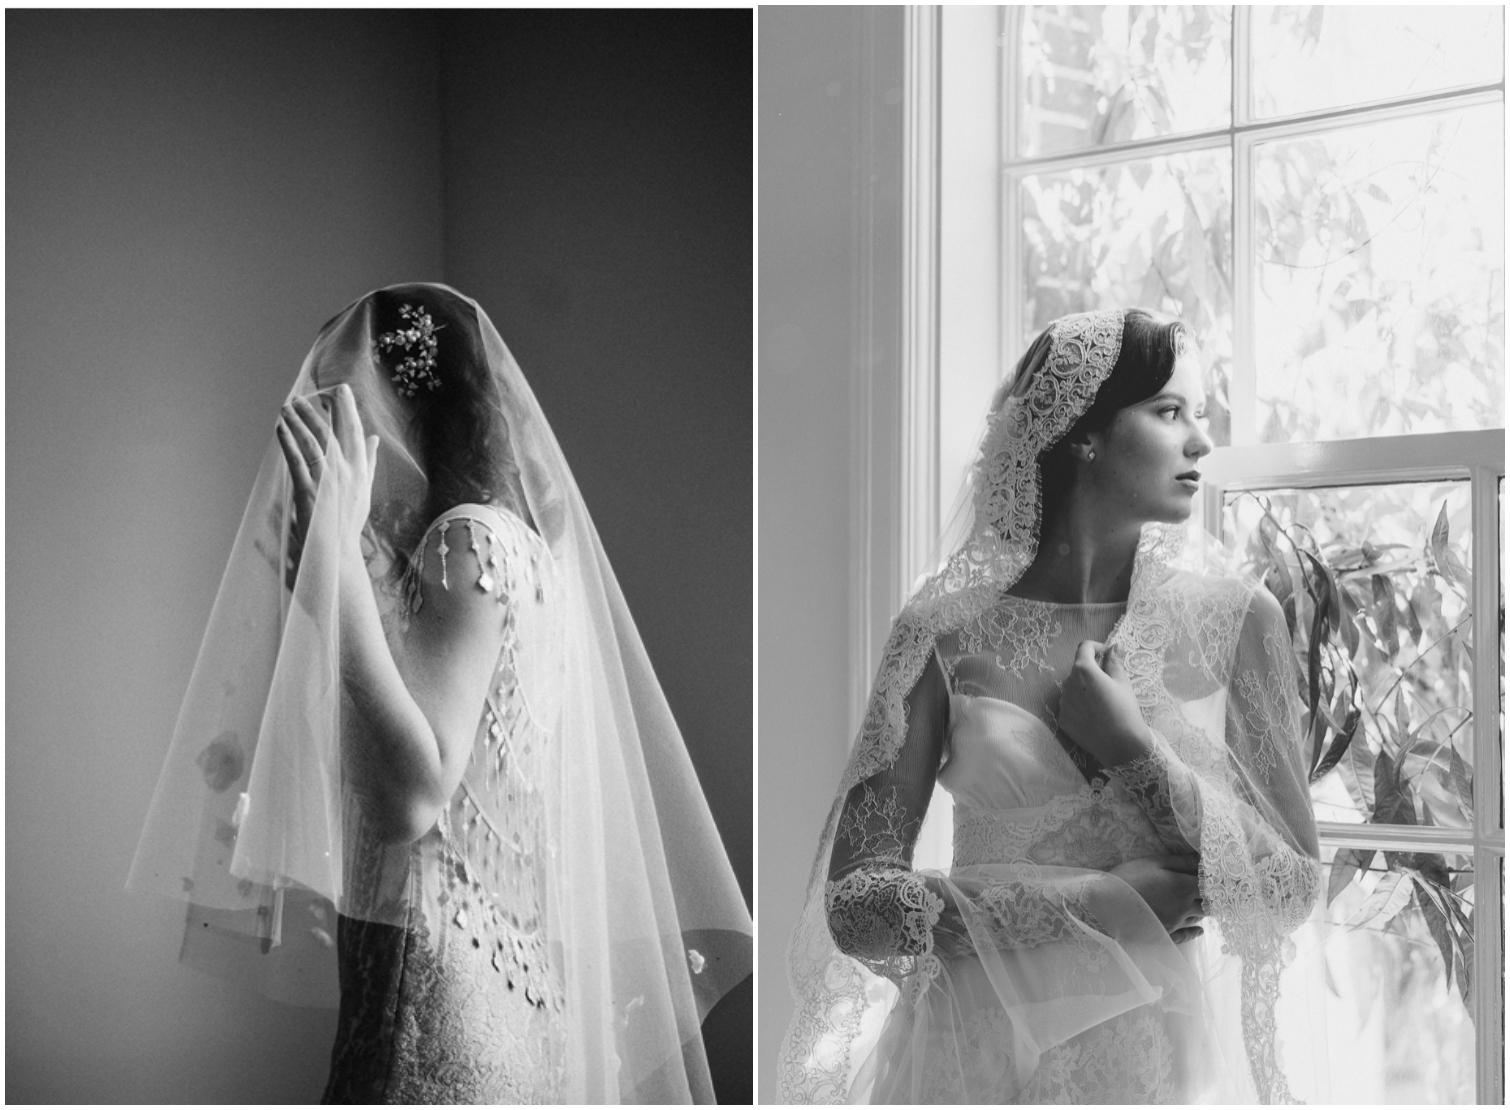 ©-celine-chhuon-Mariage-robes-Claire-Pettibone-gothicangel (3).jpg